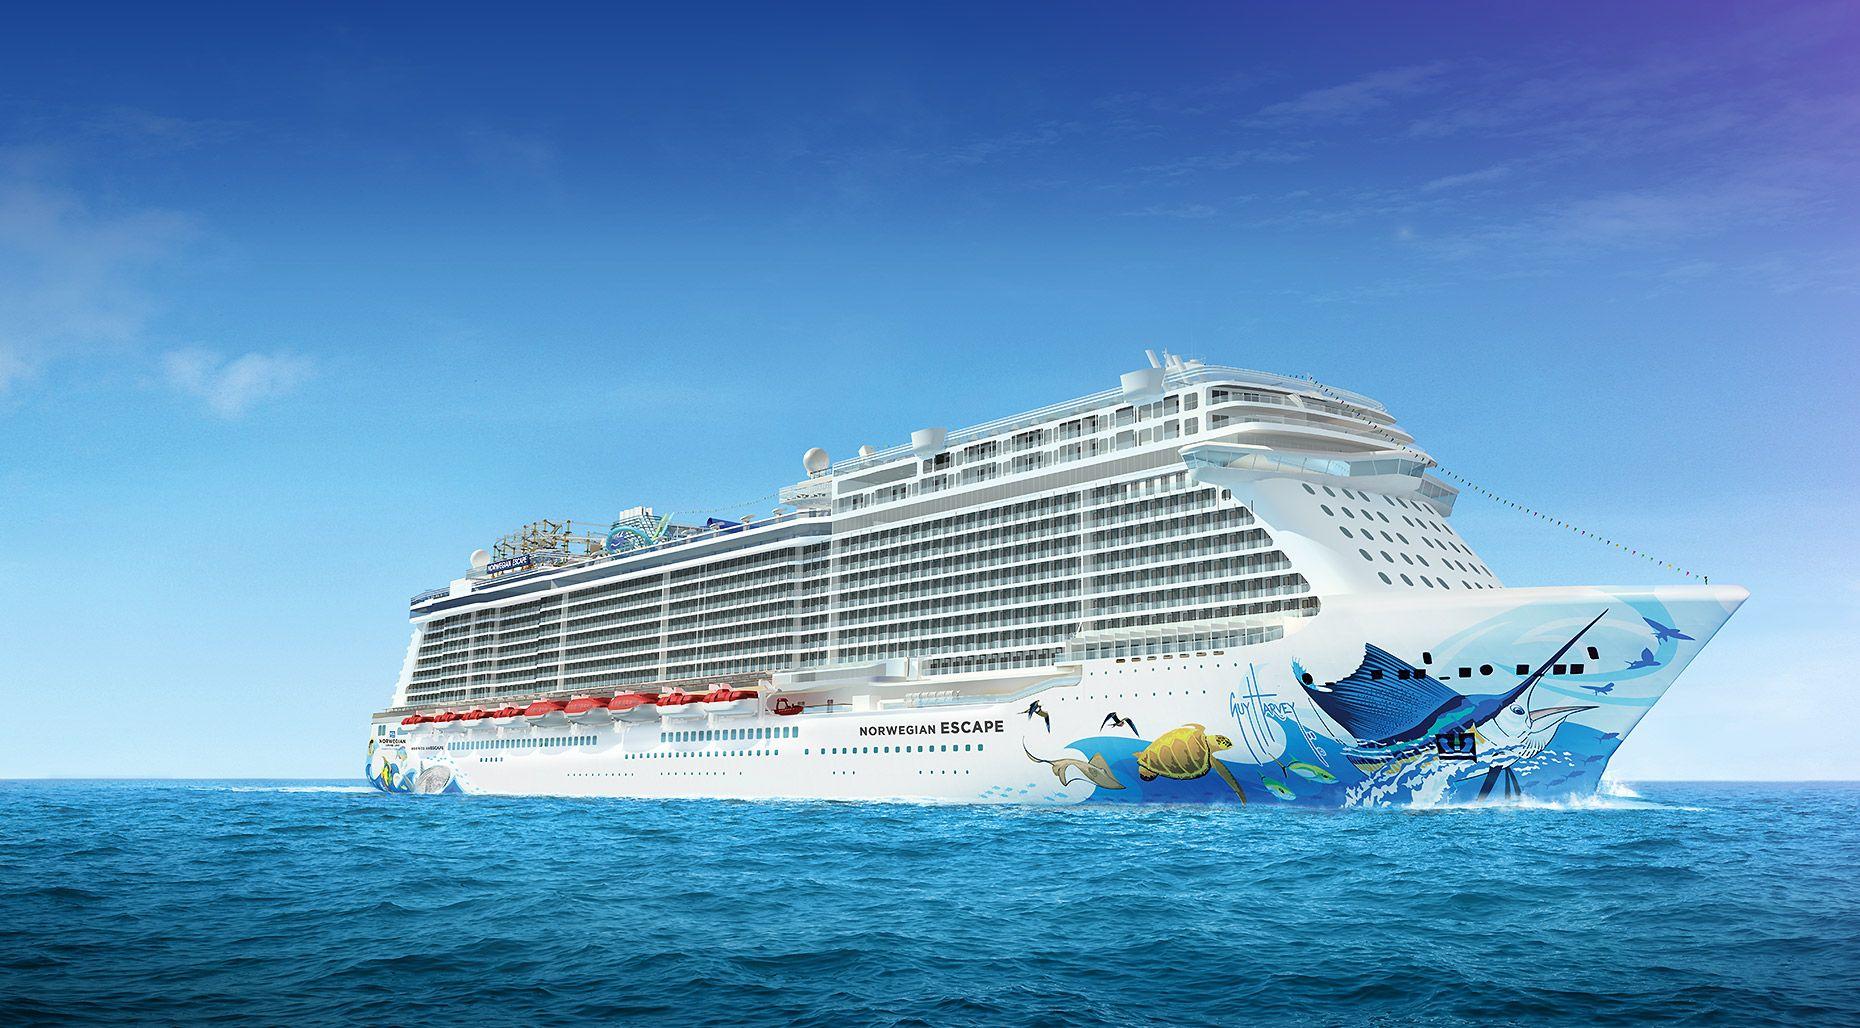 Do You Love To Cruise New Cruise Ship Norwegian Escape Departing - How do cruise ships work